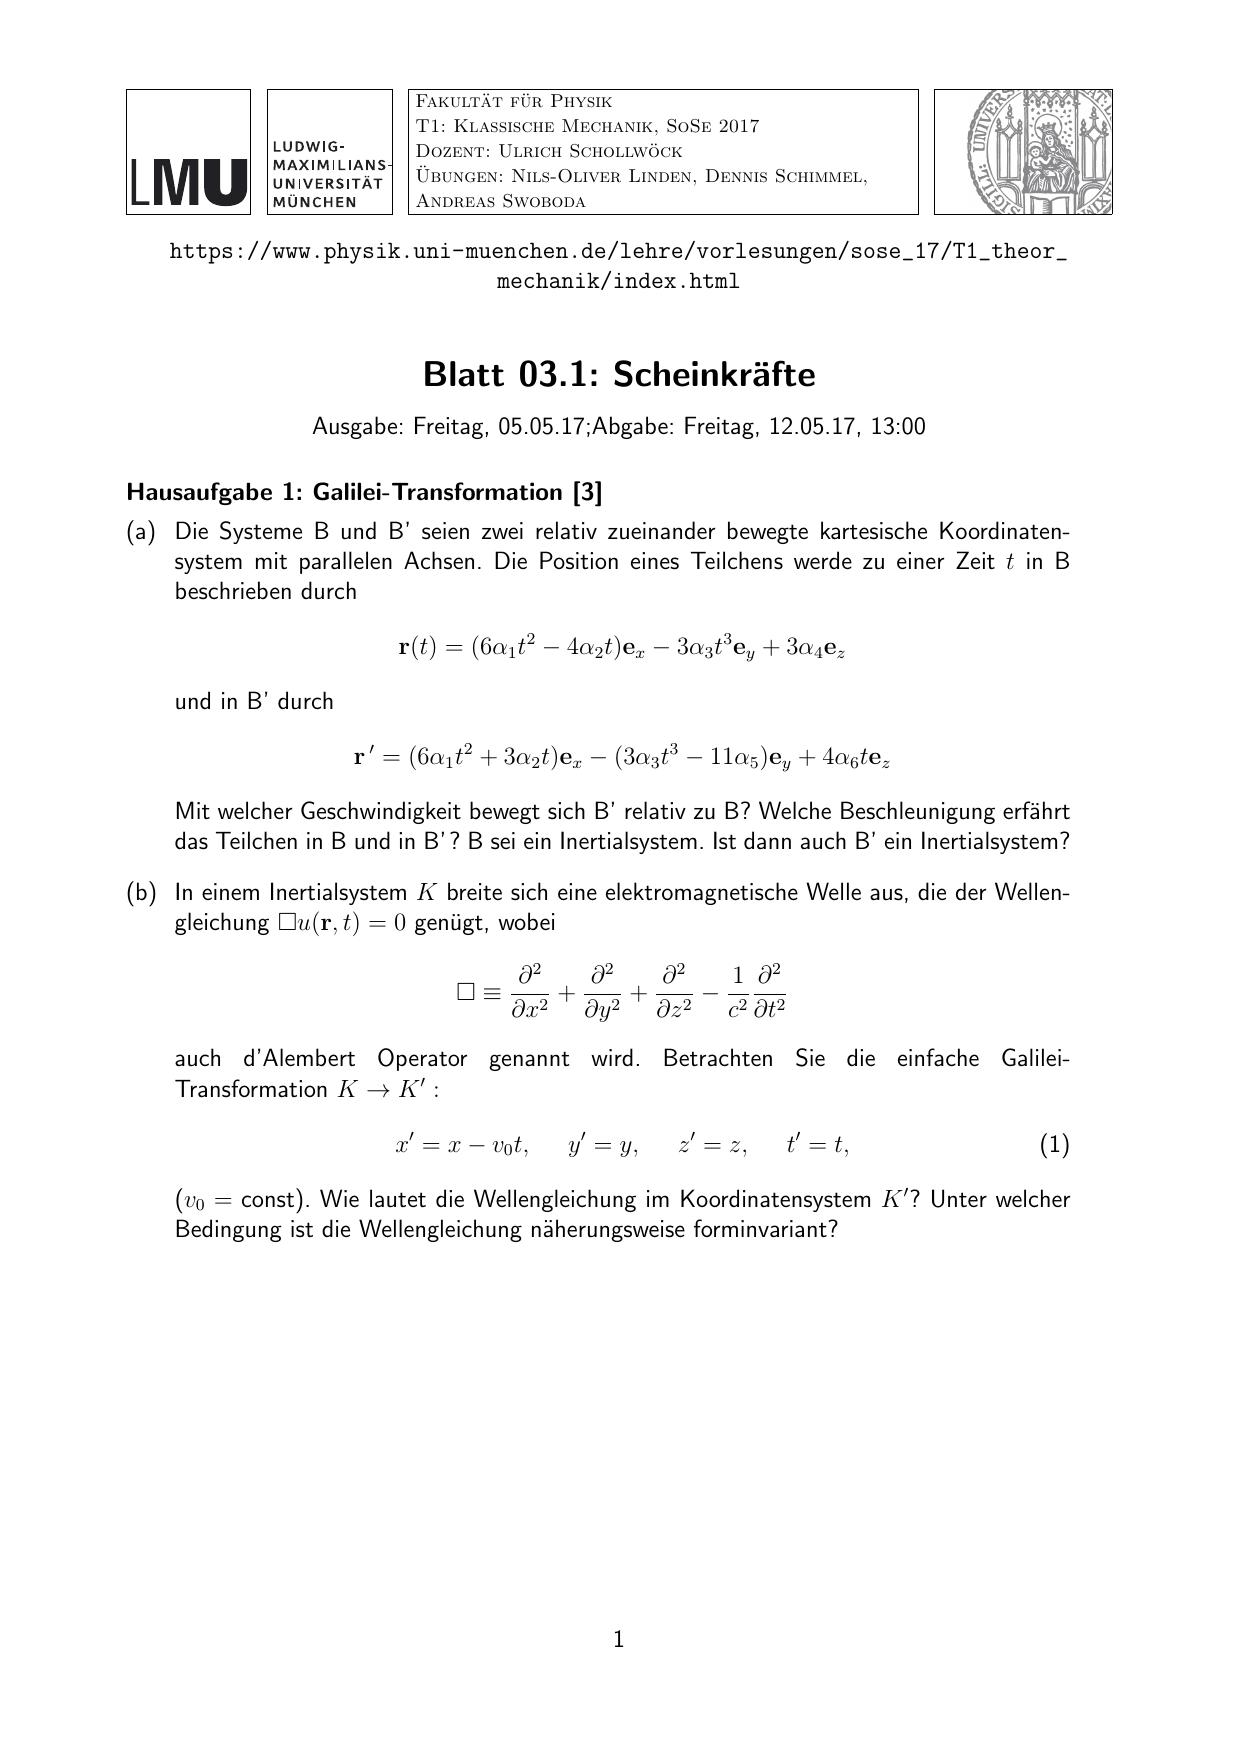 Blatt 03.1: Scheinkräfte